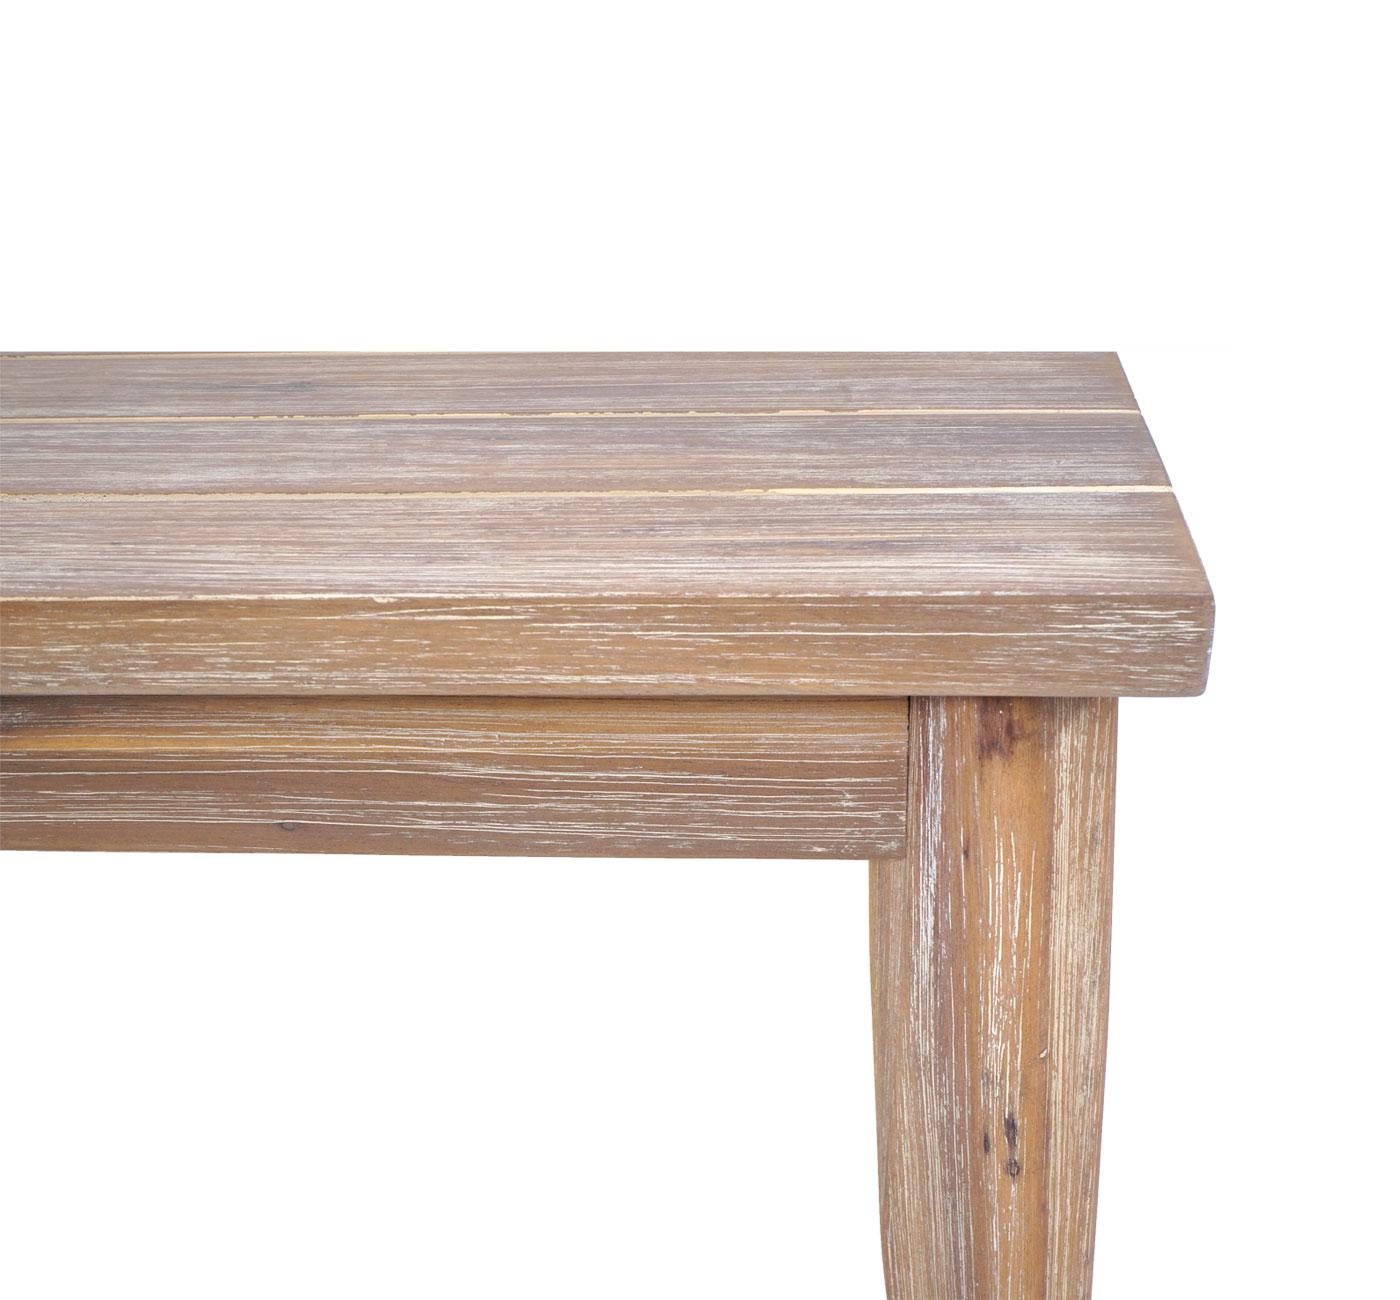 Gartengarnitur HWC-H55 Detailbild Tischplatte